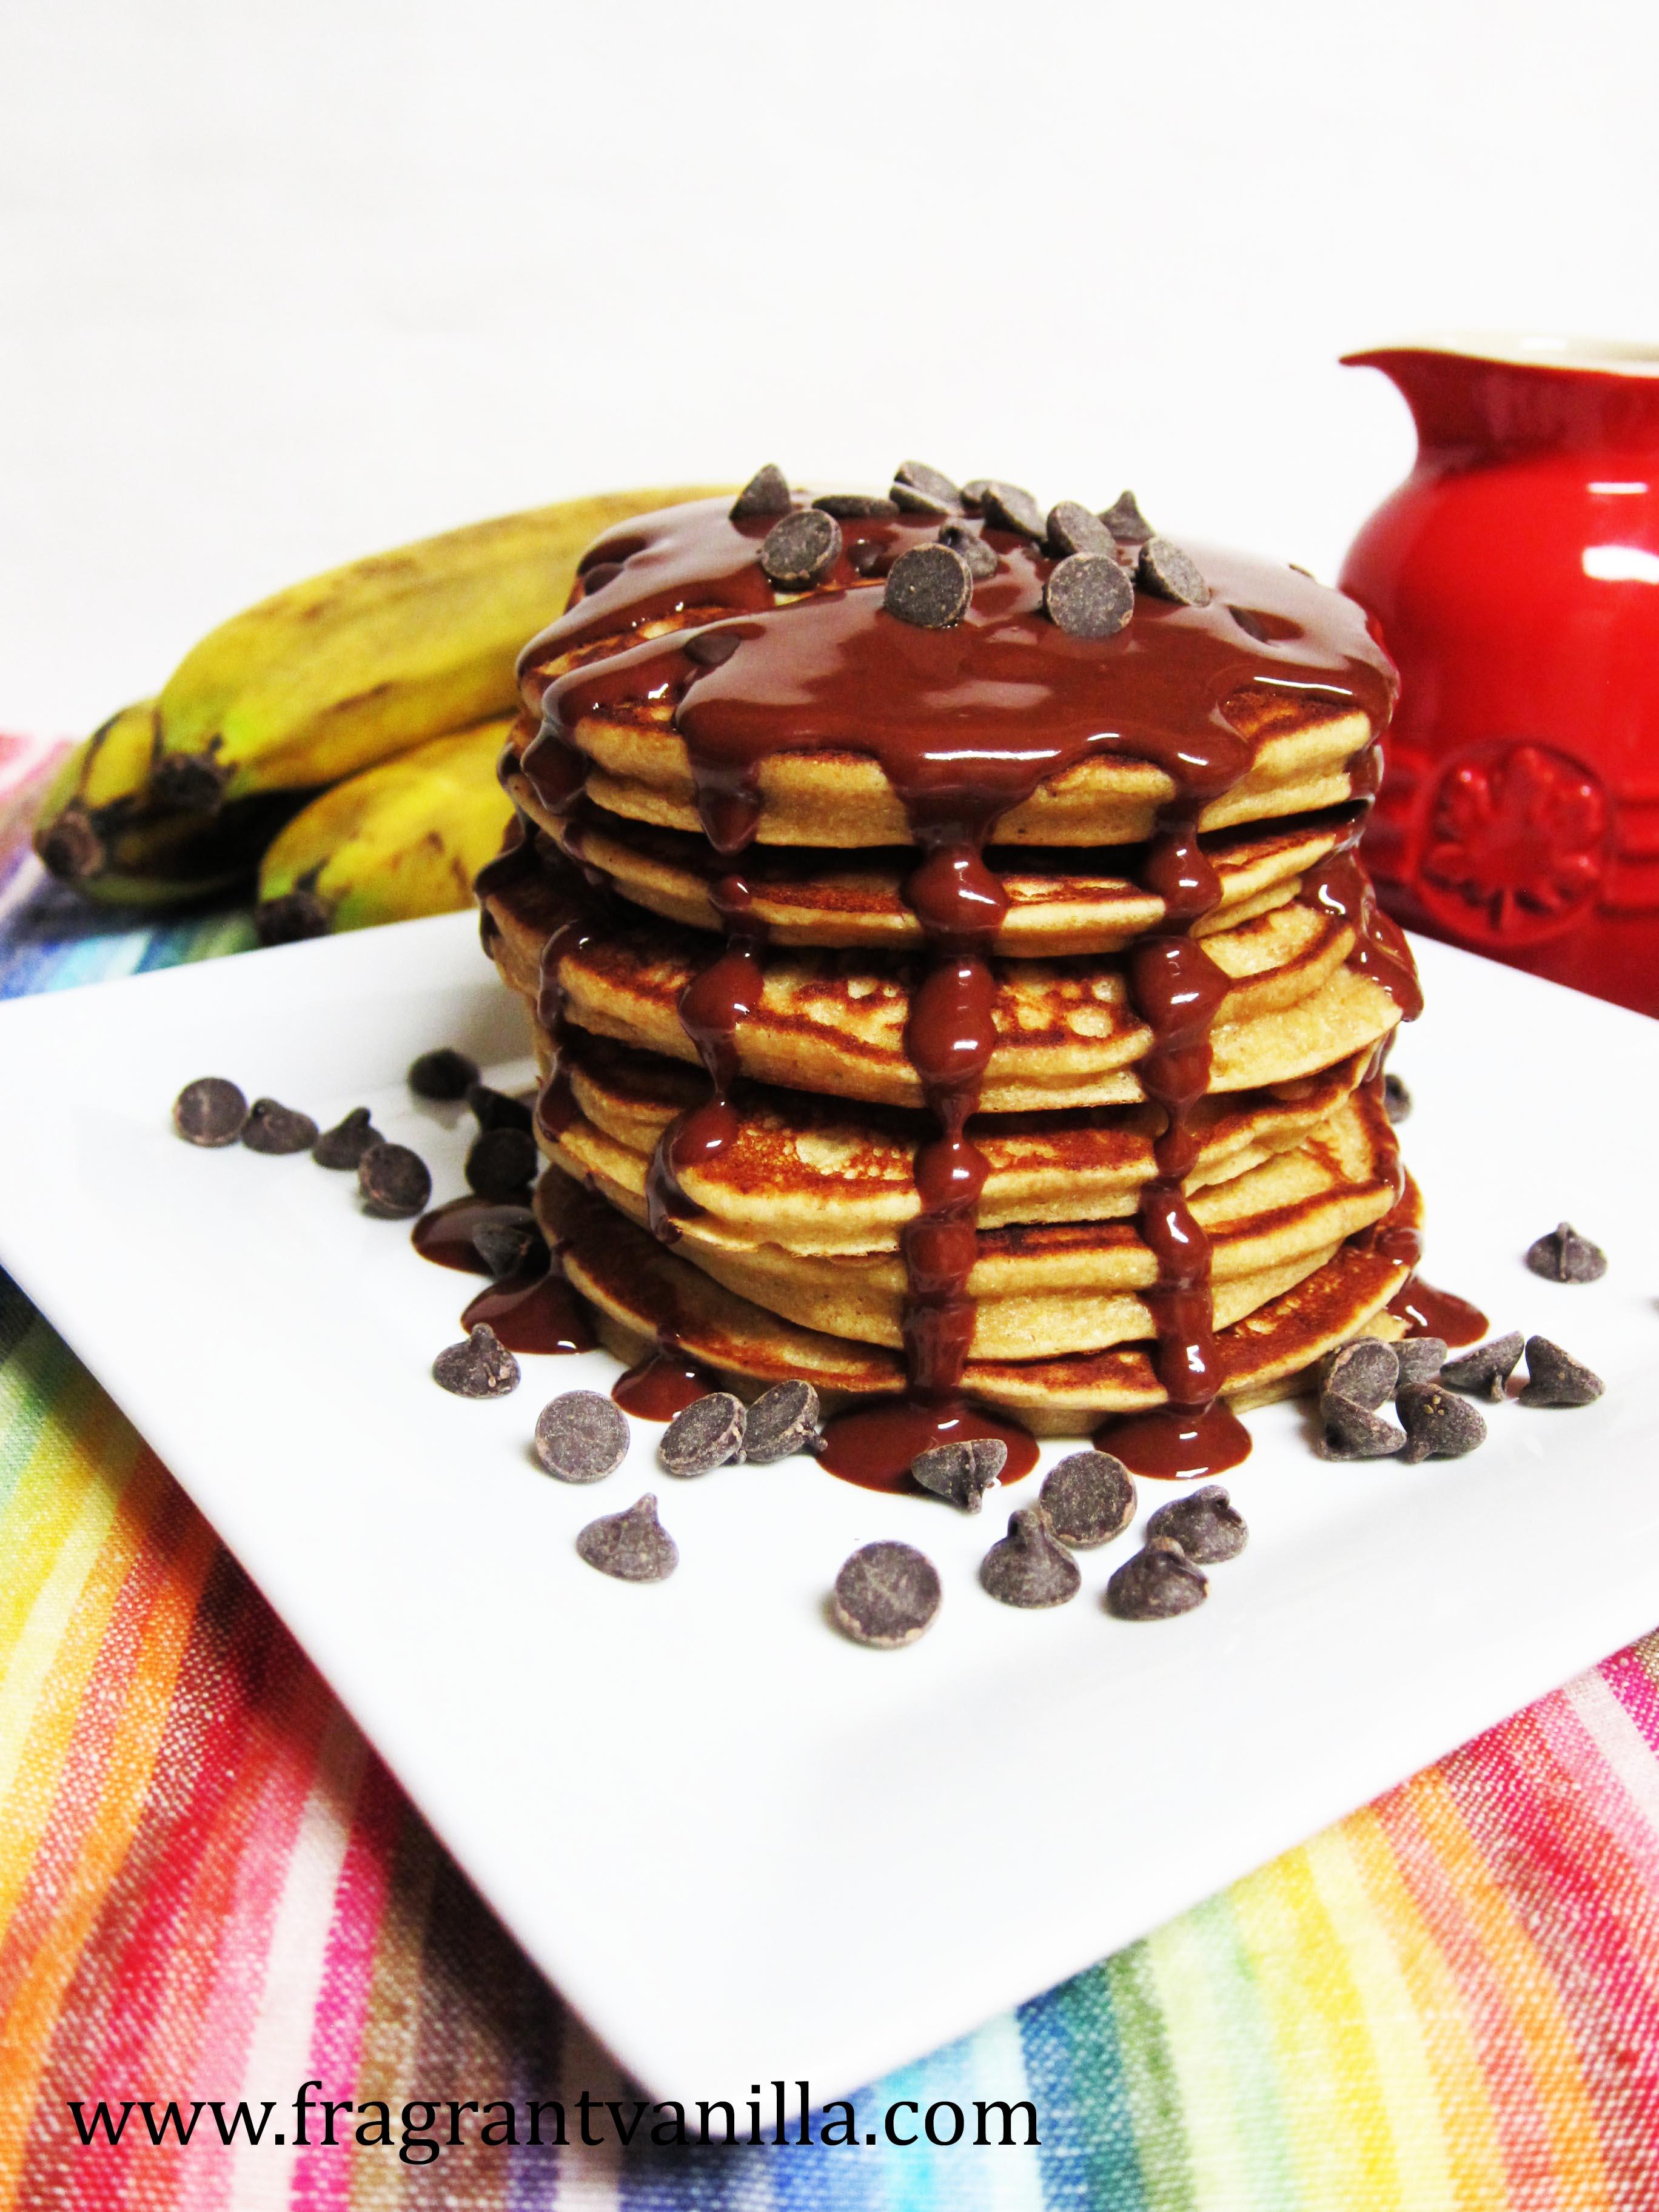 Vegan Peanut Butter Banana Chocolate Chip Pancakes